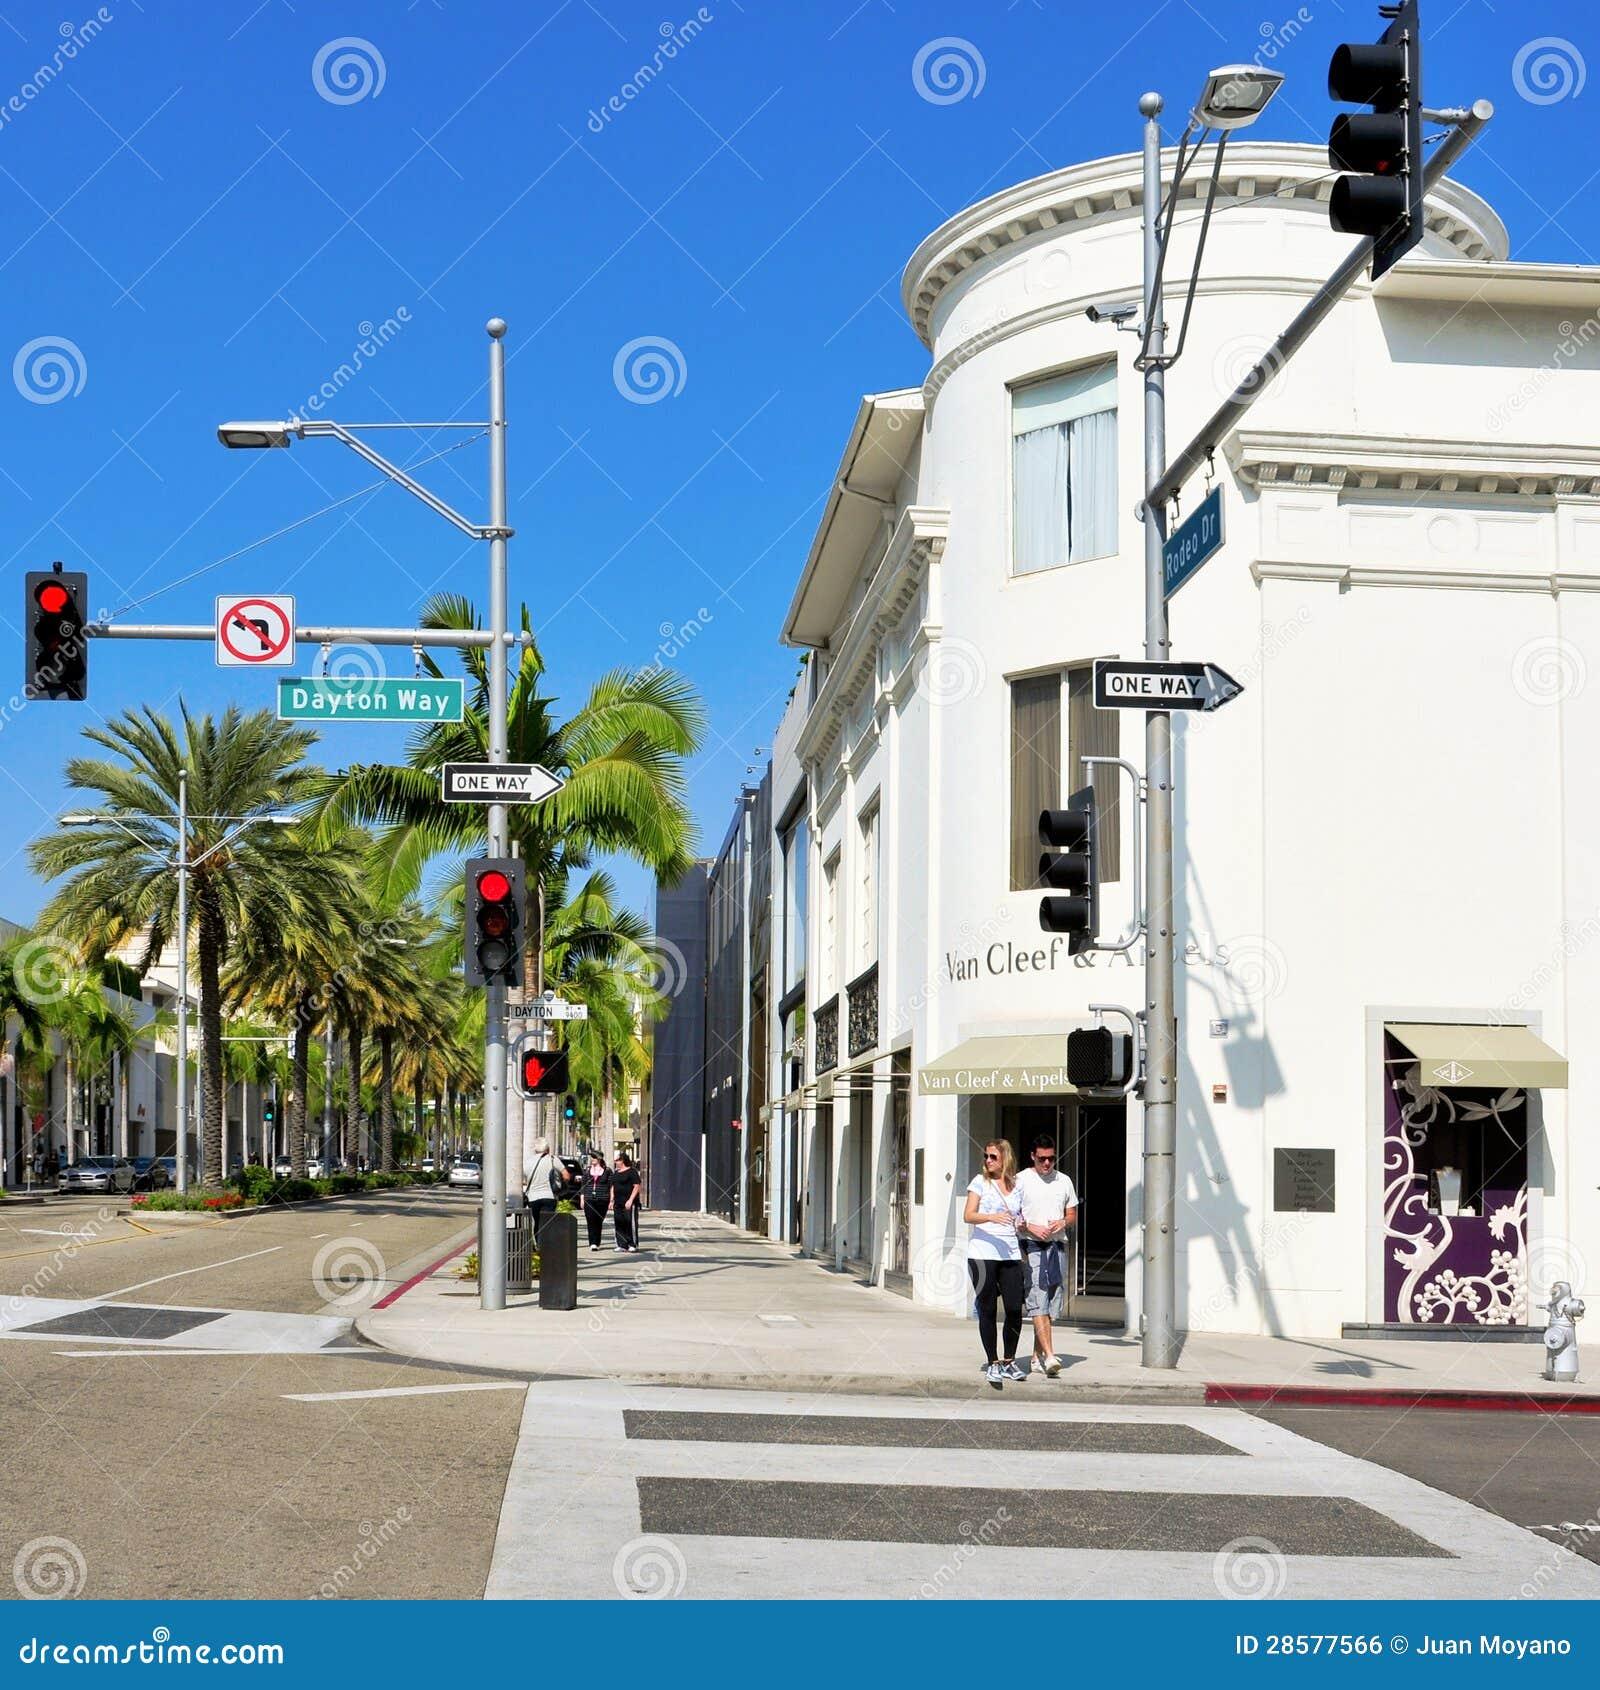 Rodeodrev, Beverly Hills, United States